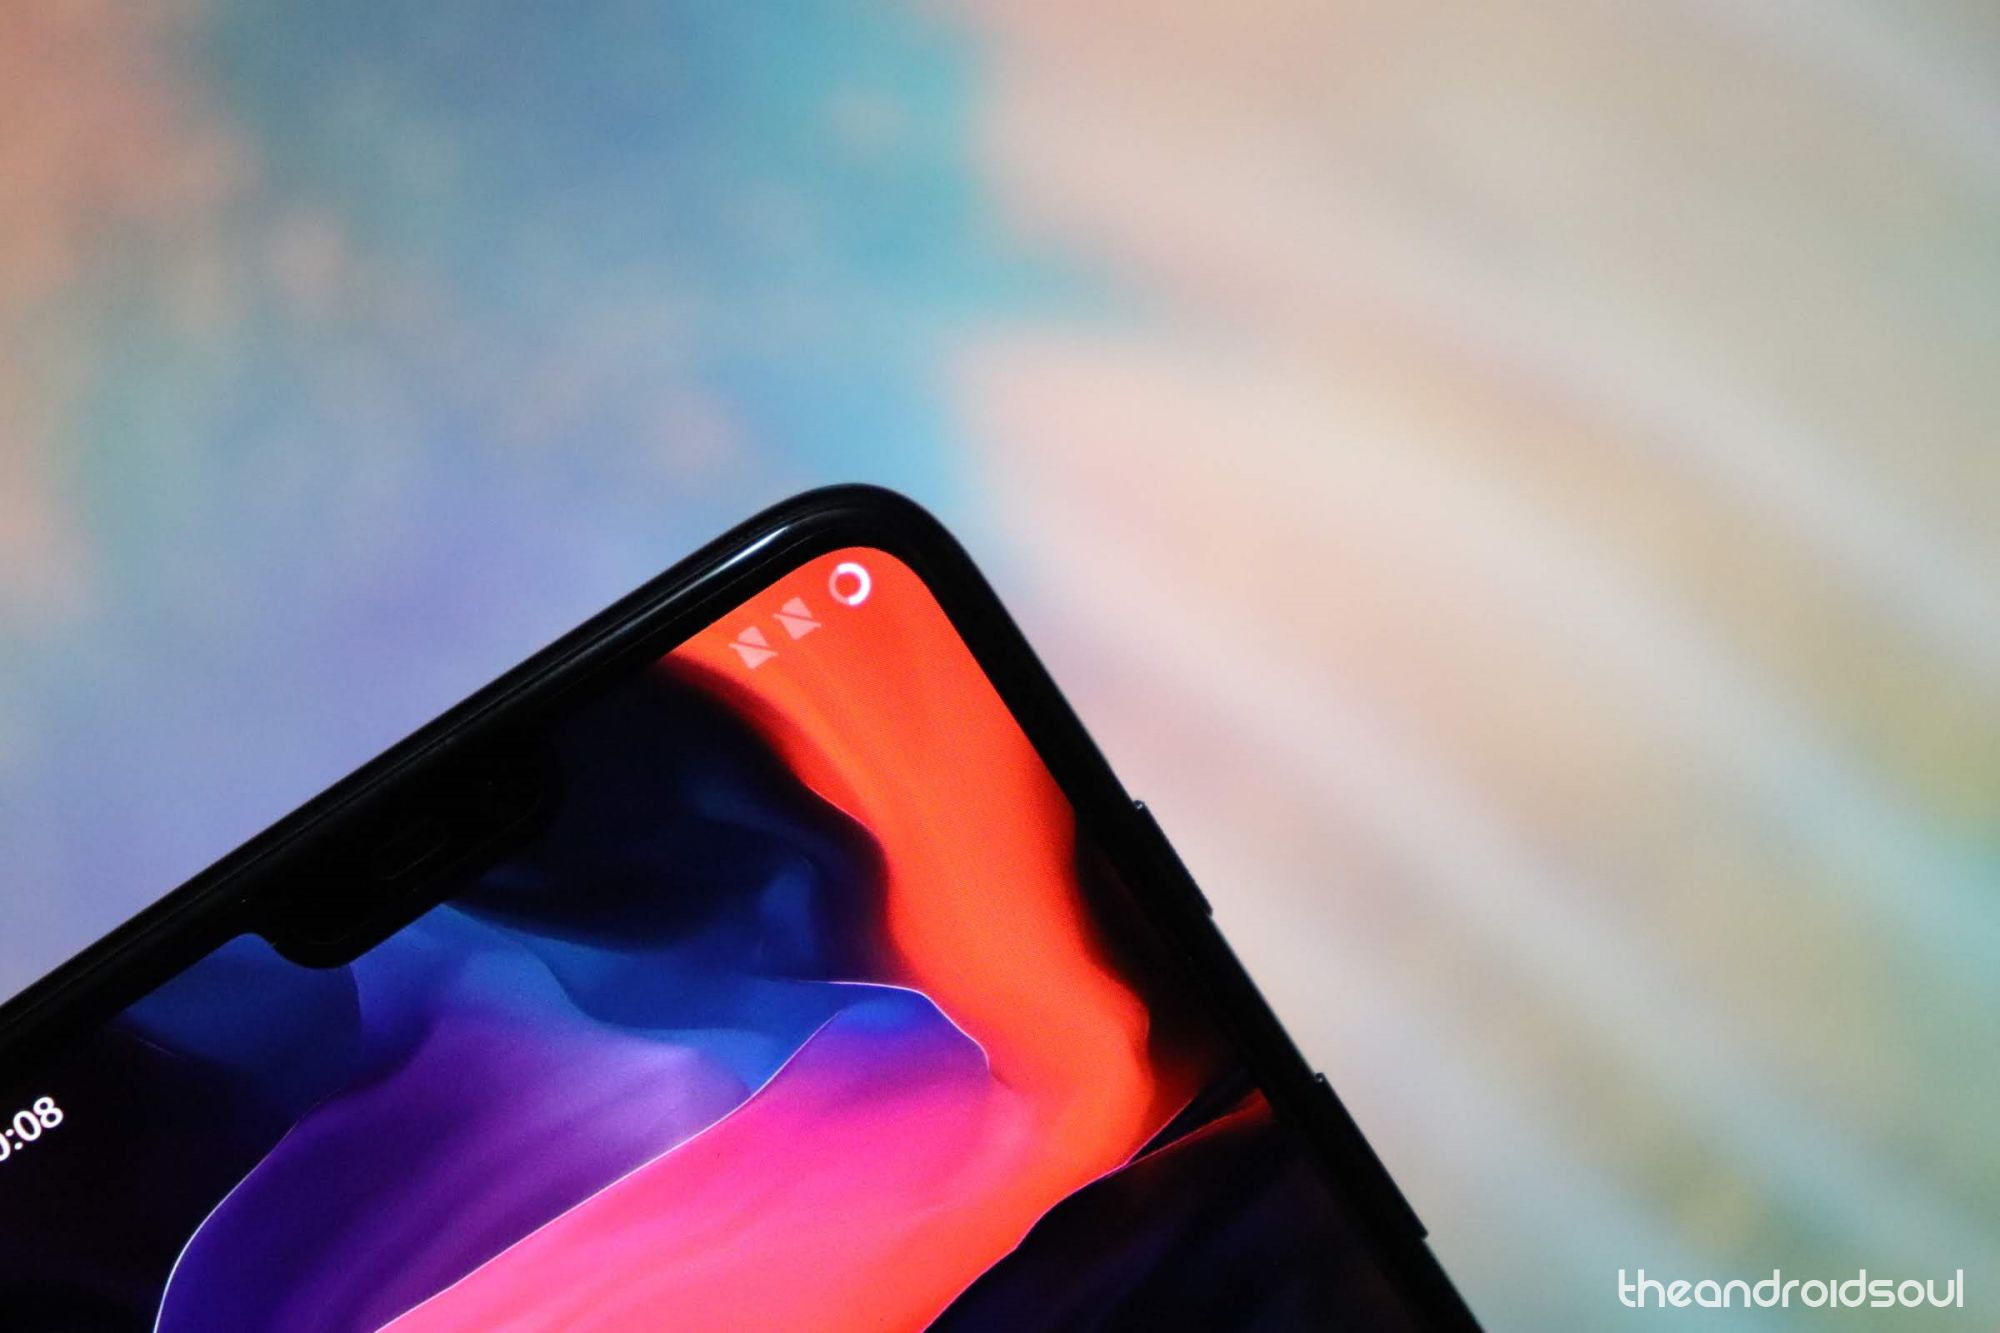 OnePlus-6-image-15